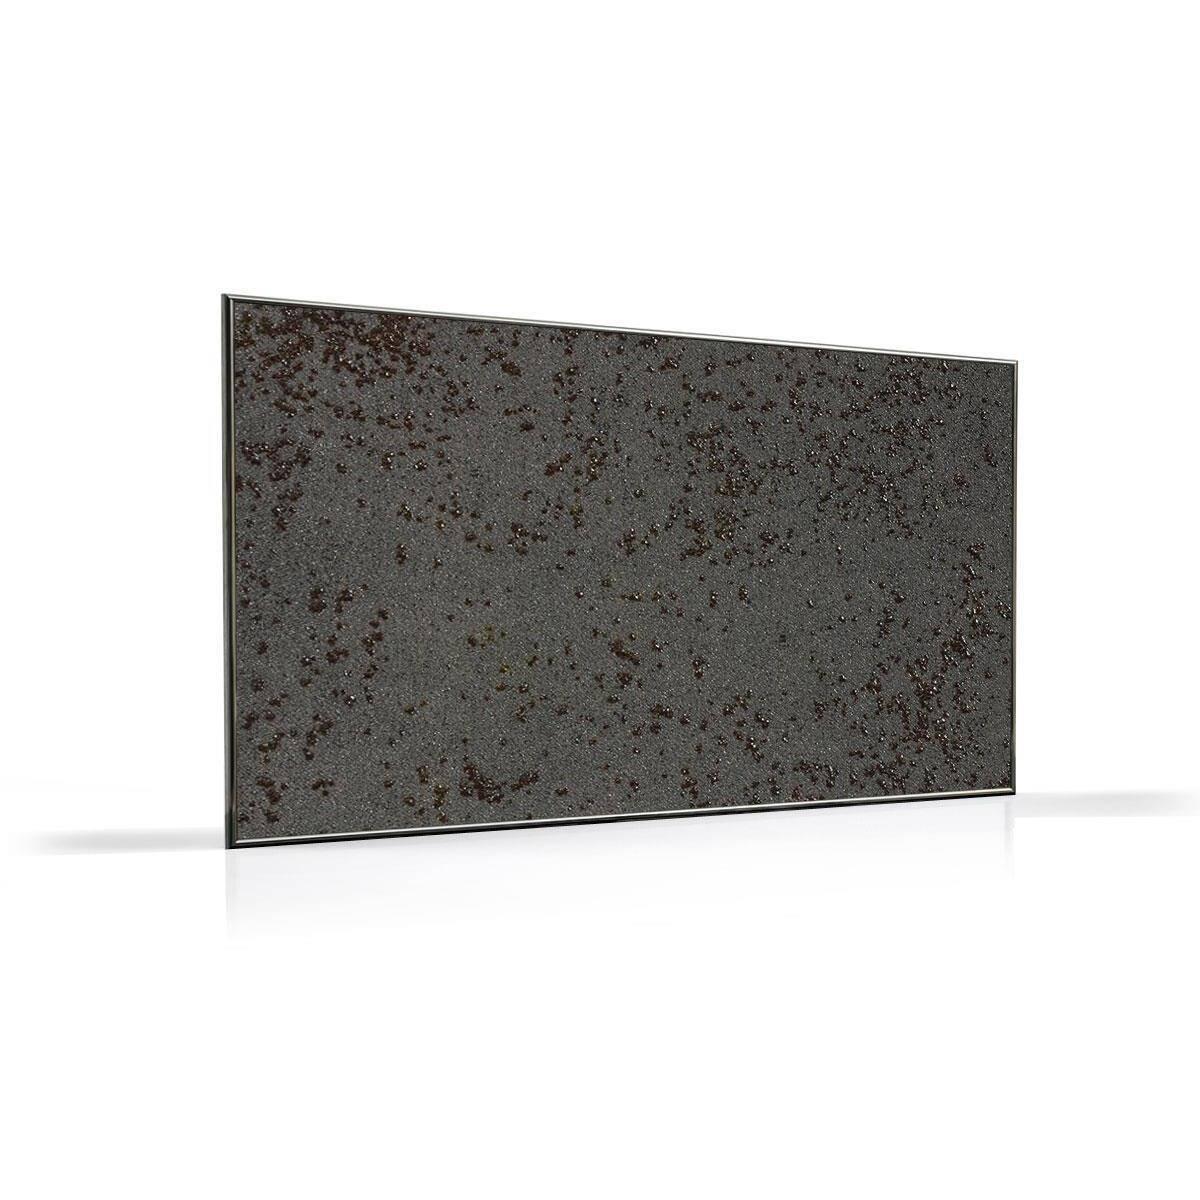 keramik infrarotheizung elbotherm 600 watt iron grey 399 00. Black Bedroom Furniture Sets. Home Design Ideas